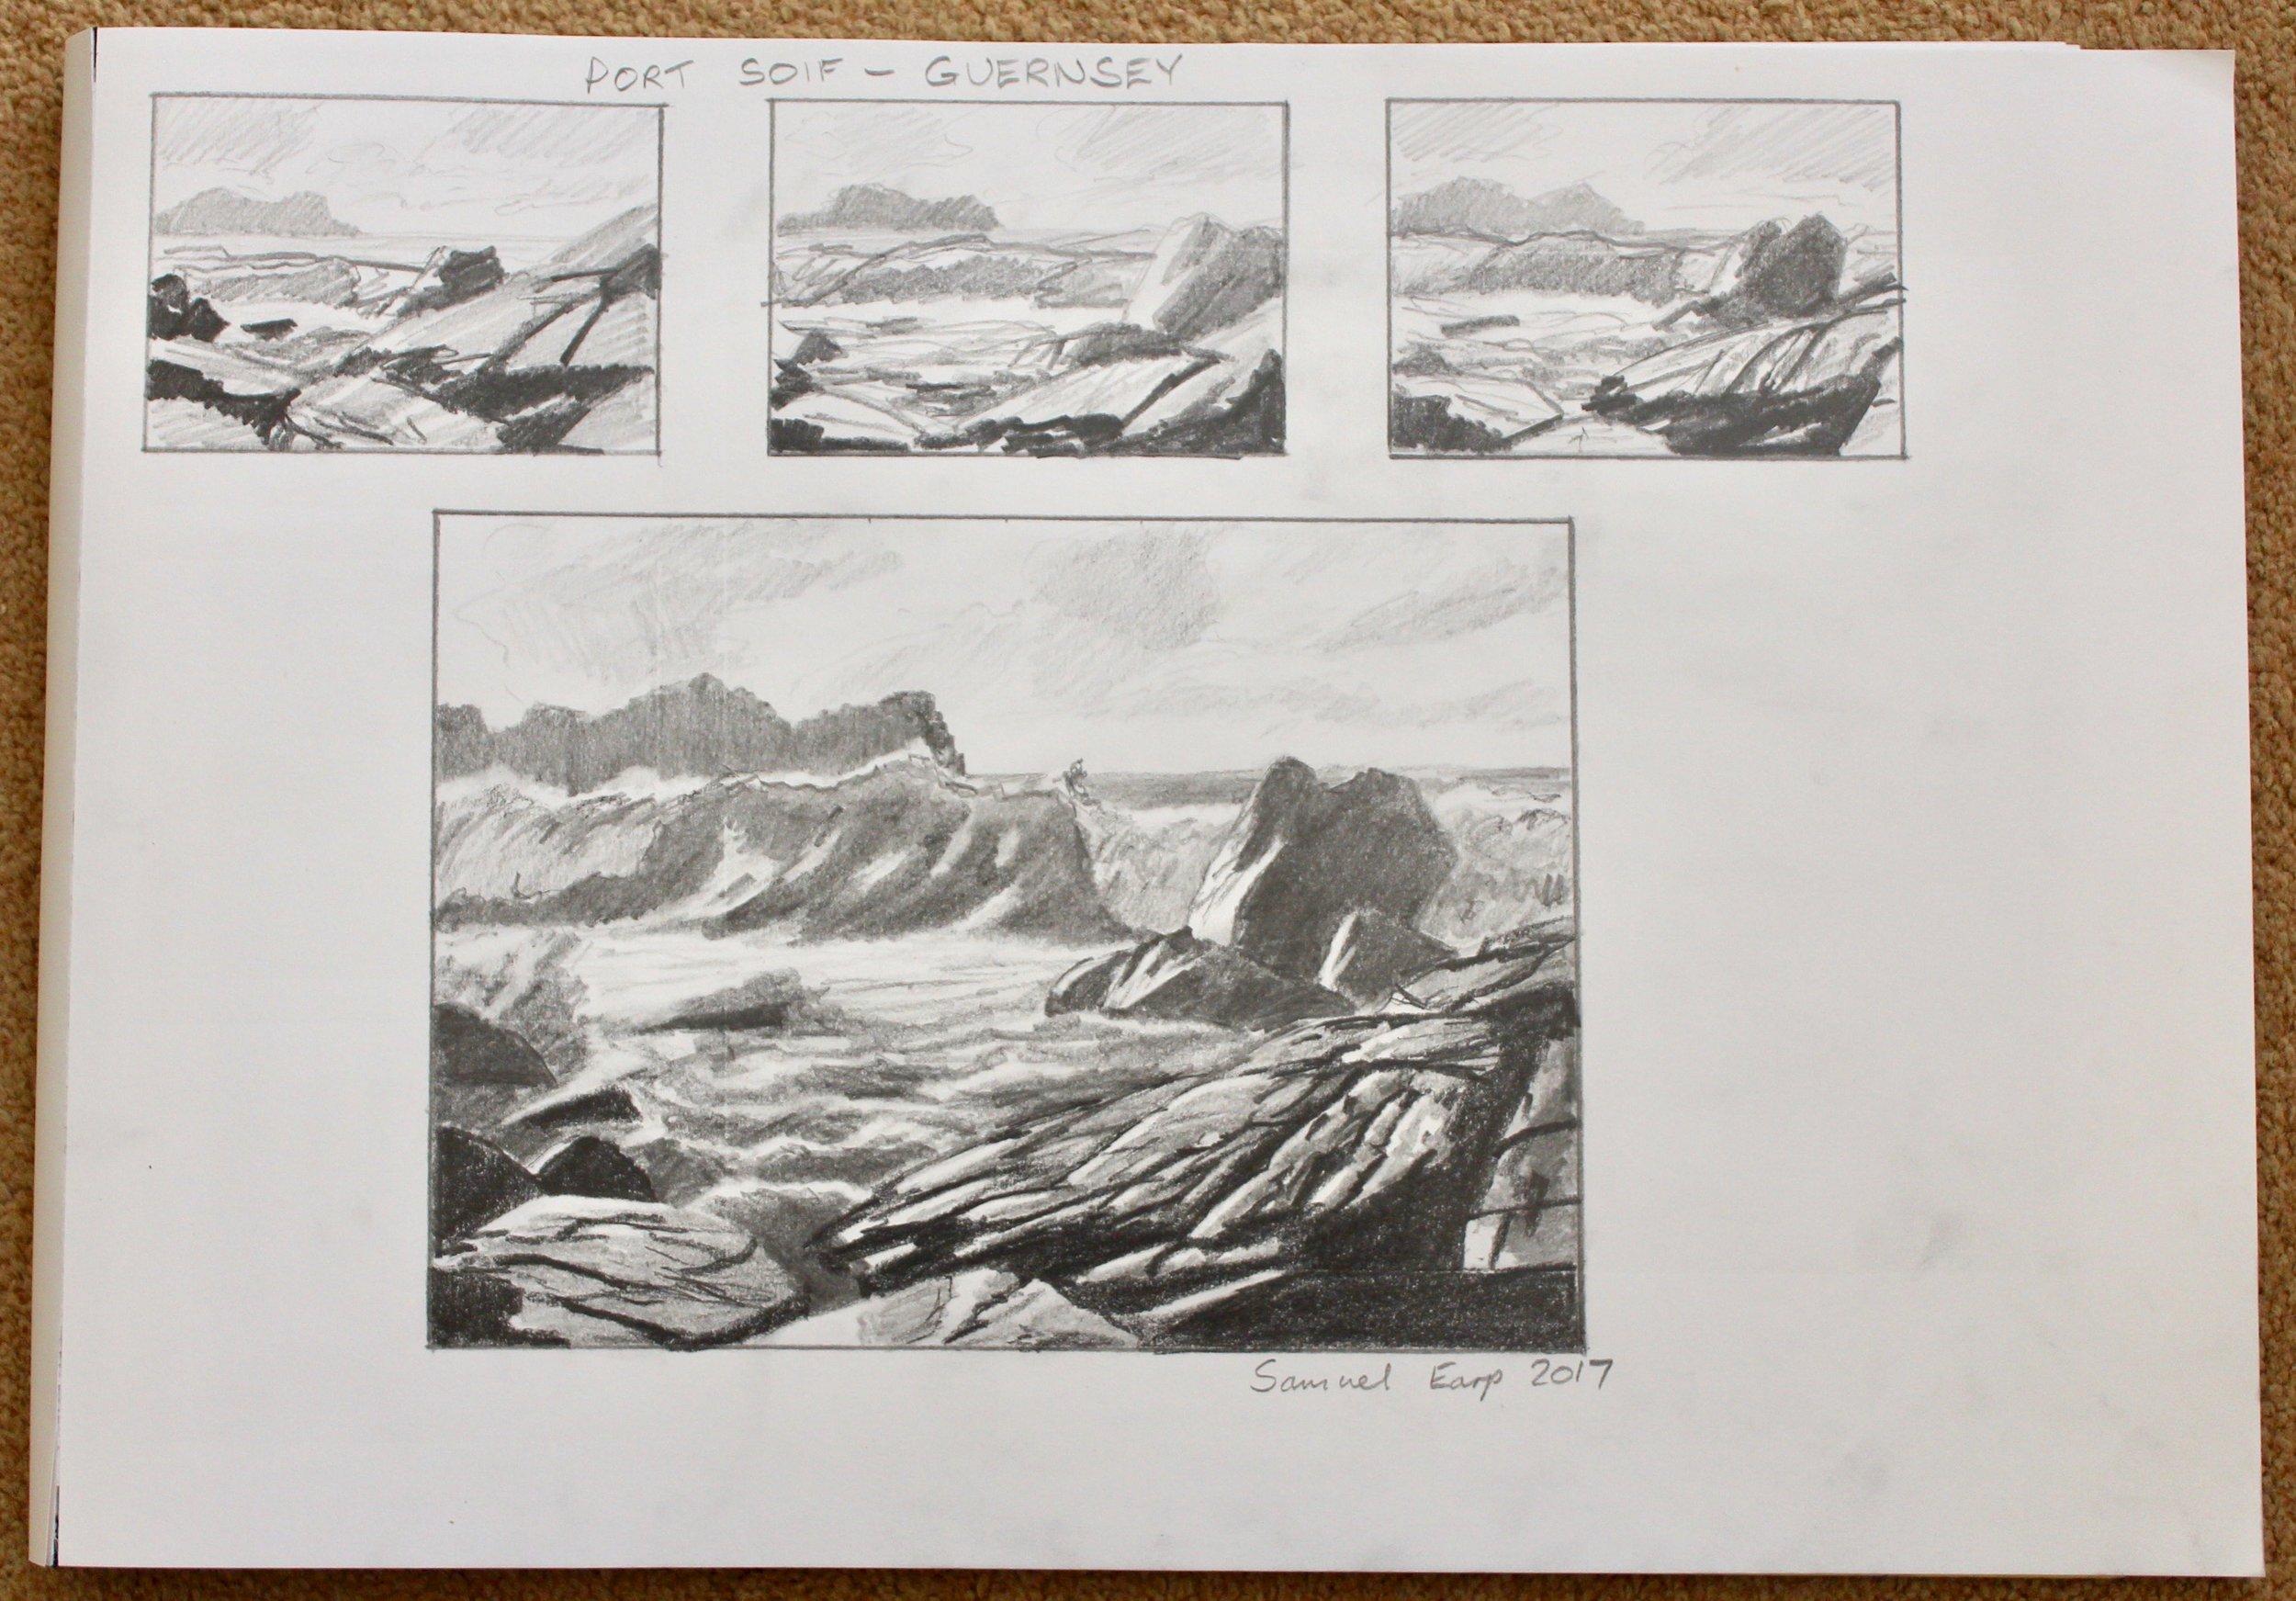 Port Soif - Pencil Sketch - Samuel Earp.jpg